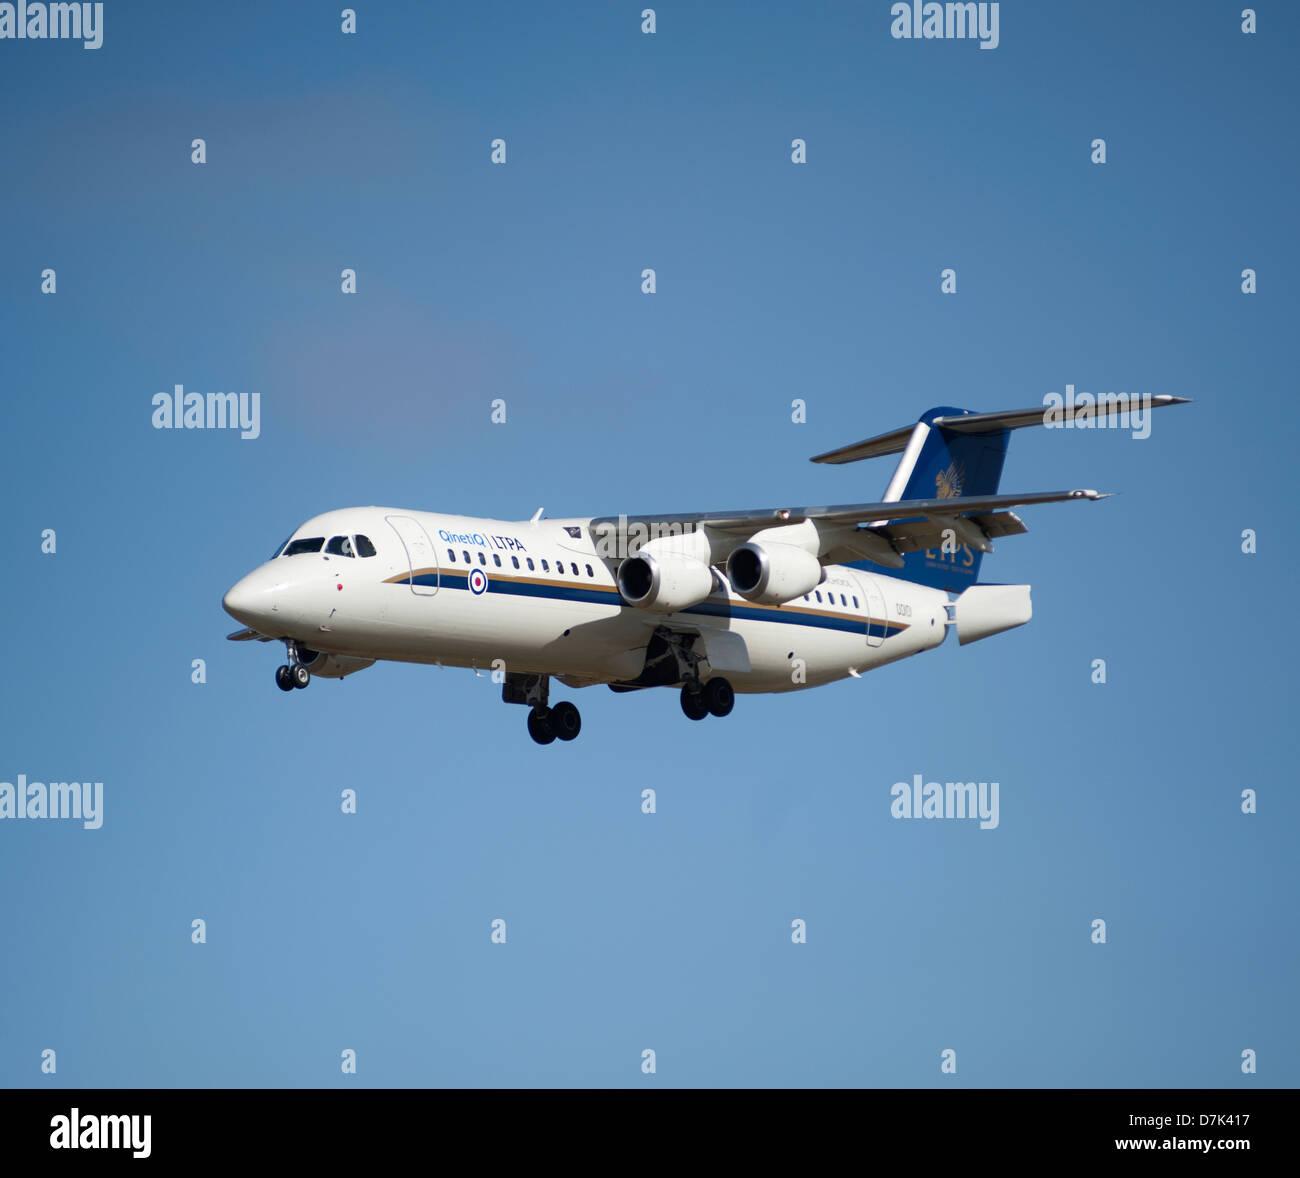 QinetiQ British Aerospace Avro 146-RJ100 ETPS. - Stock Image